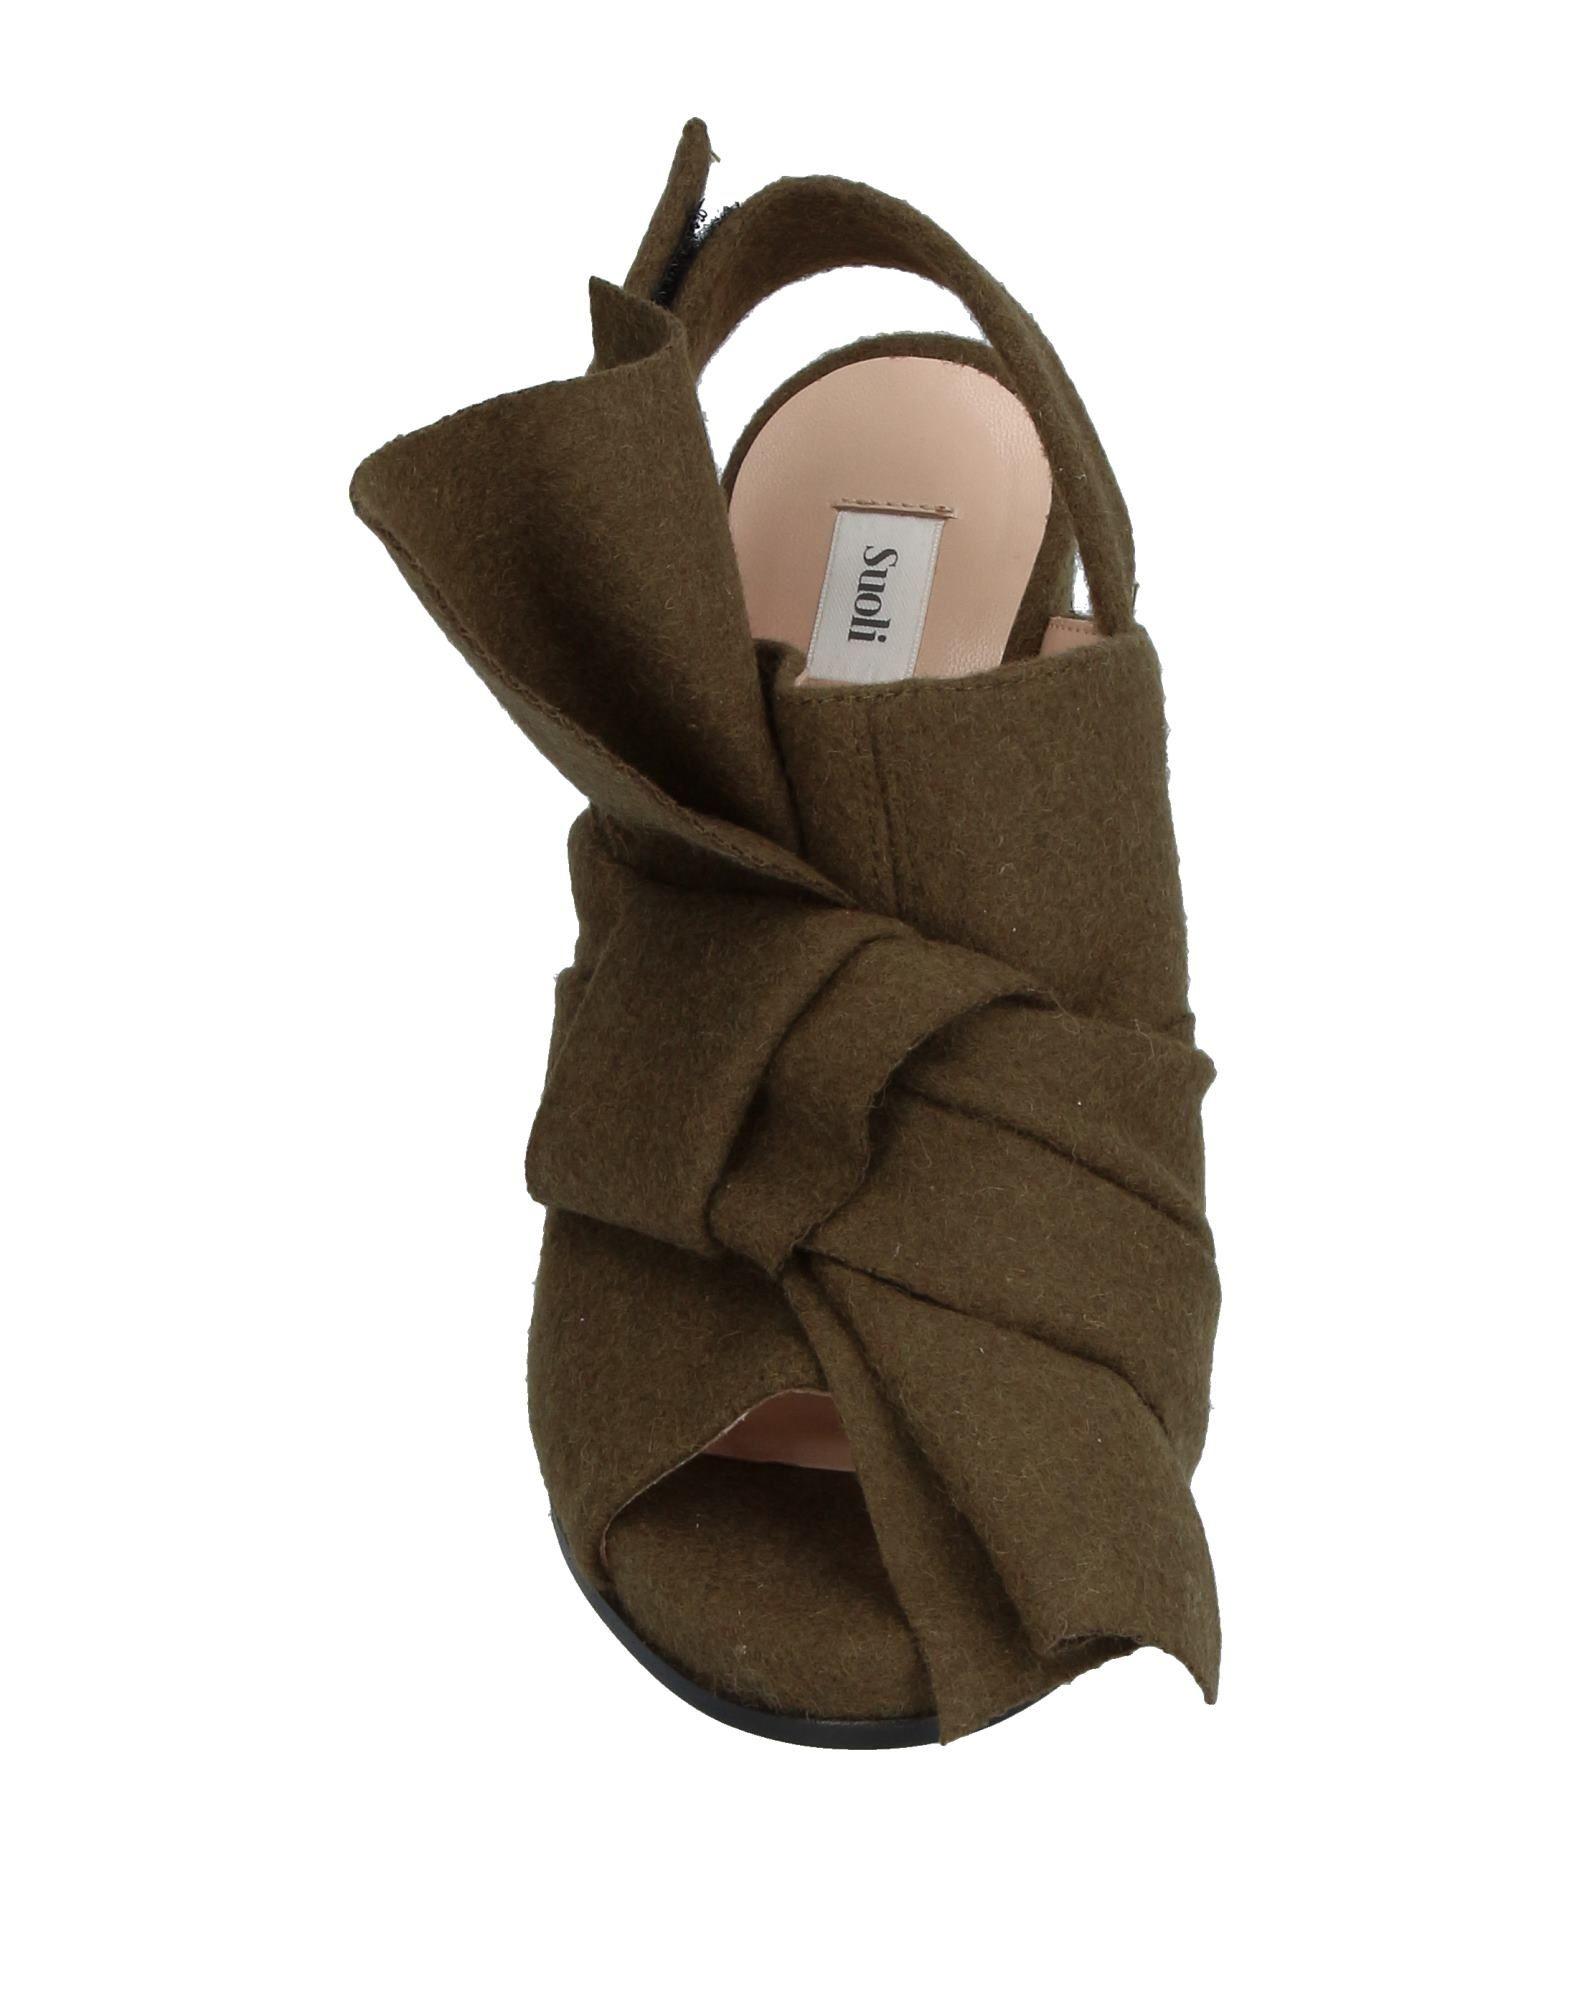 Stilvolle billige  Schuhe Suoli Sandalen Damen  billige 11215883CI 283778